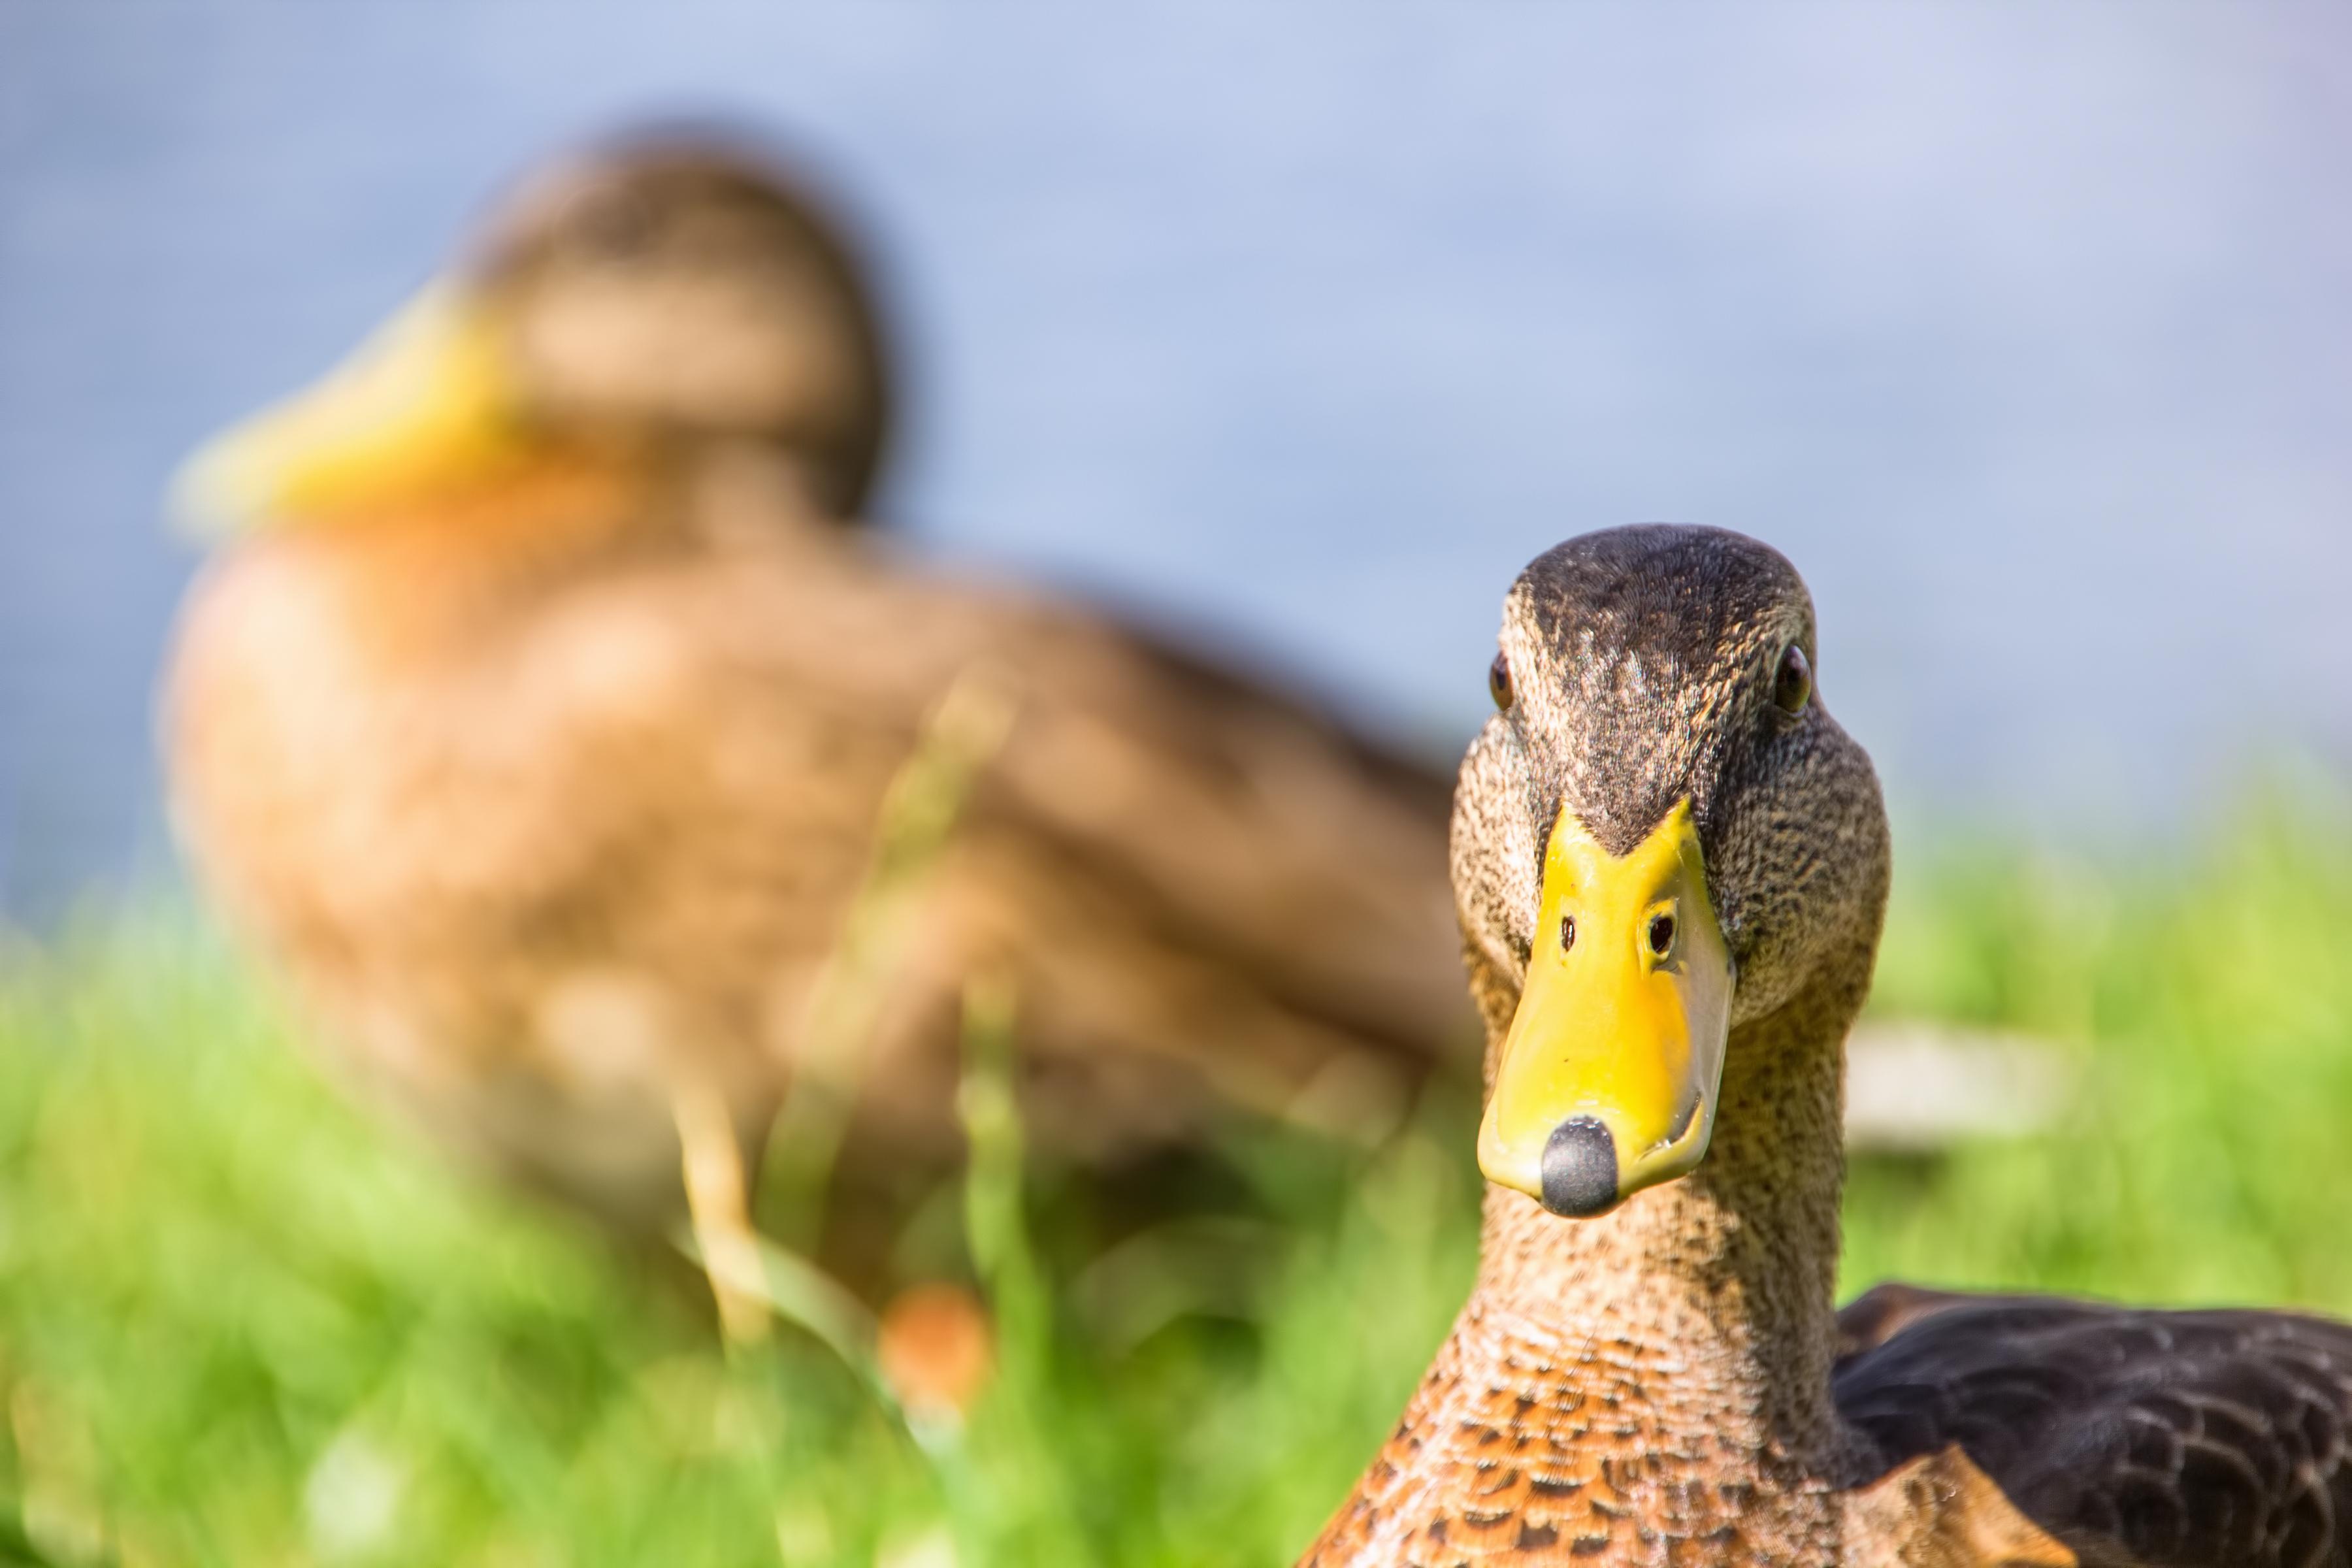 duck, Animal, Close-up, HQ Photo